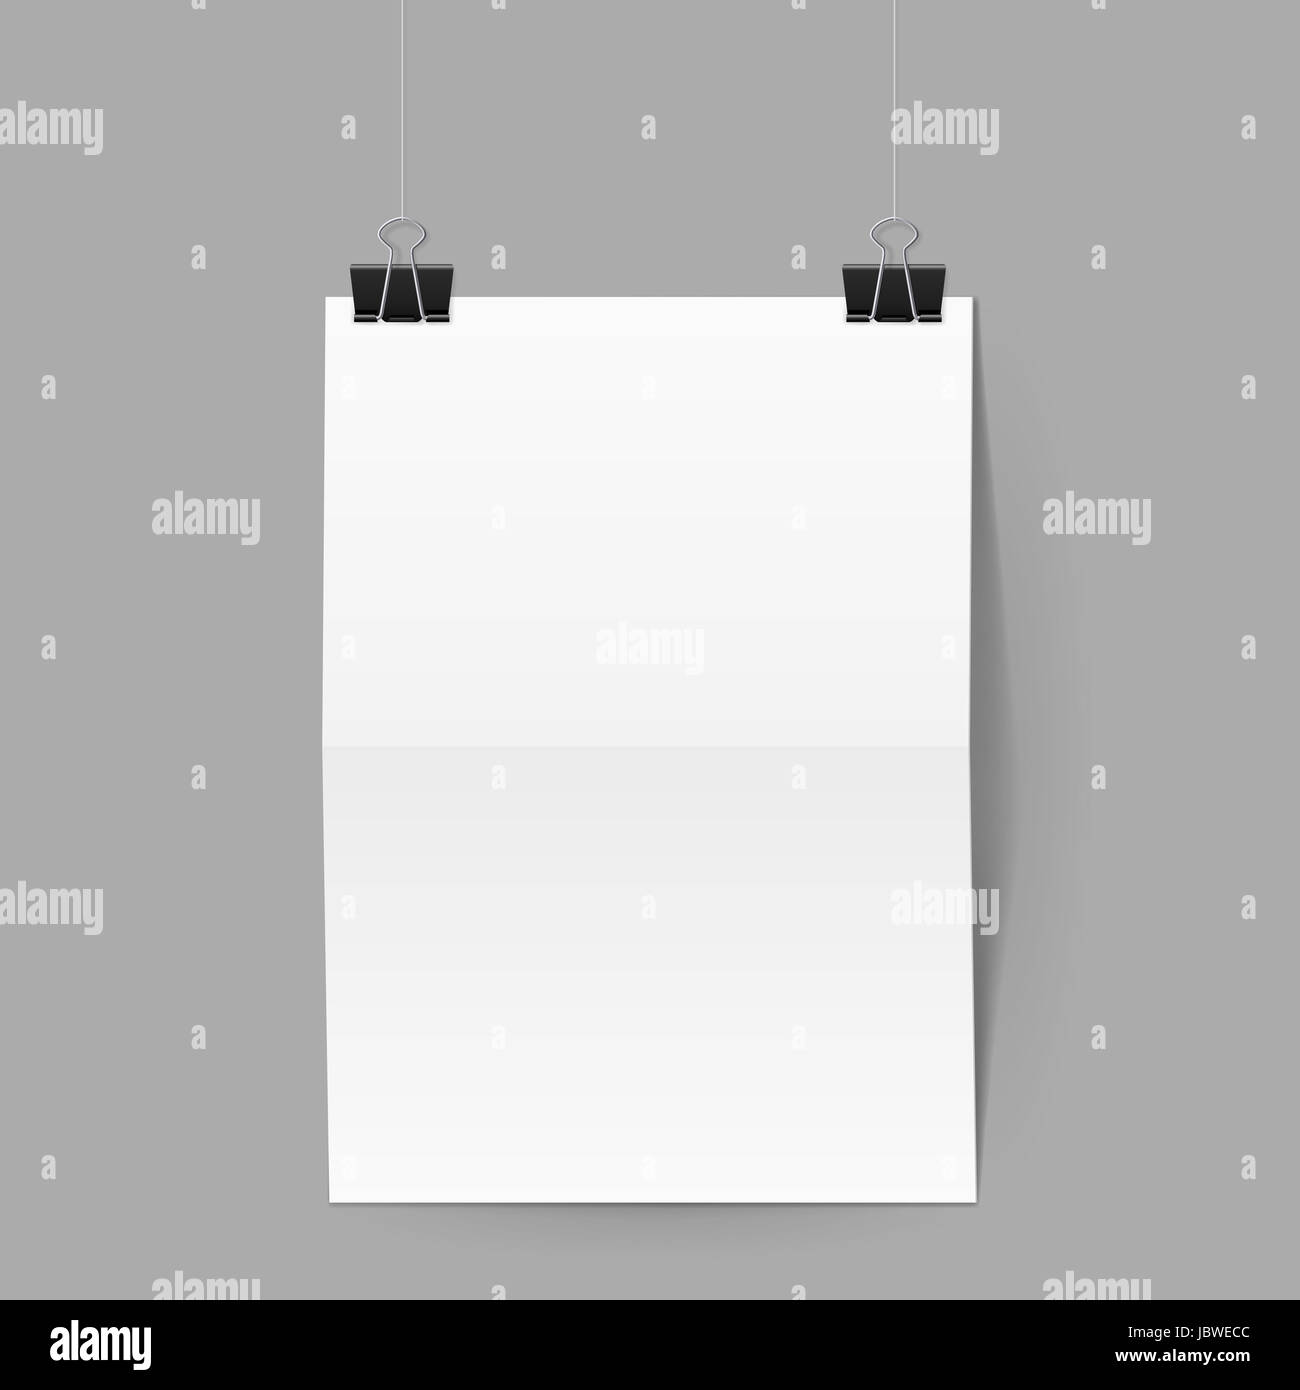 half black half white background